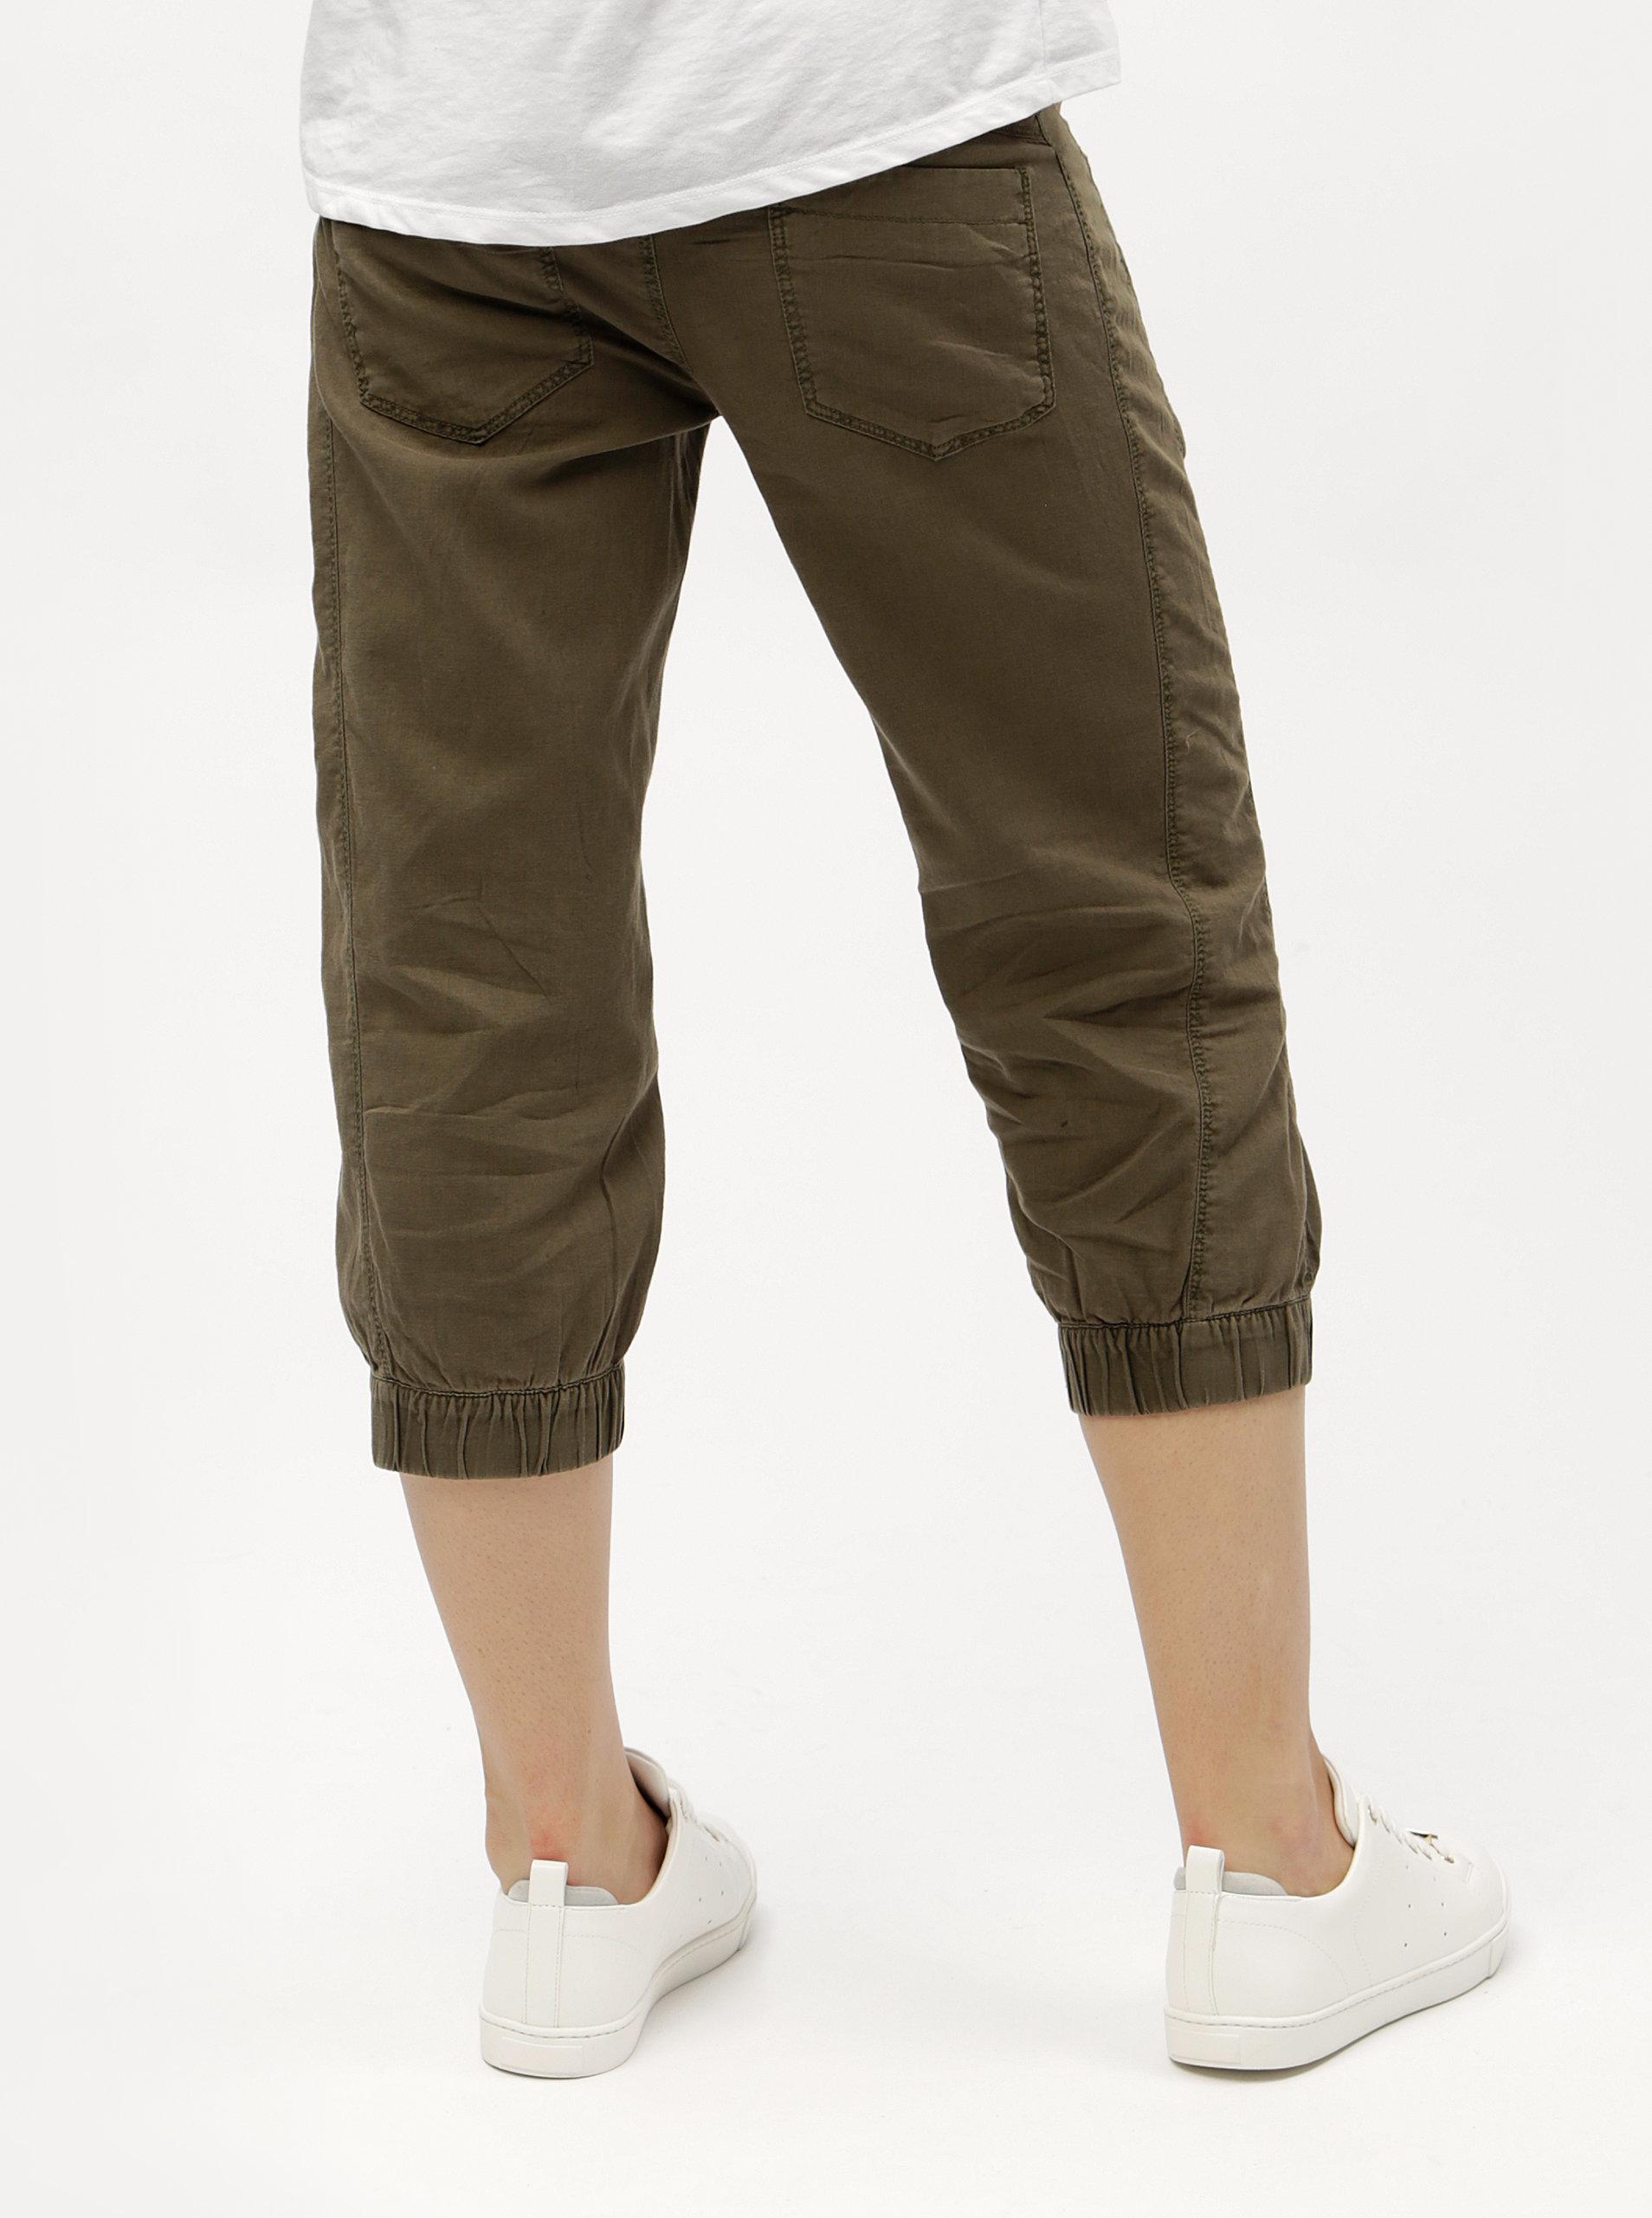 8ecf23ae6b2 Khaki lněné 3 4 kalhoty s kapsami VERO MODA Connie ...